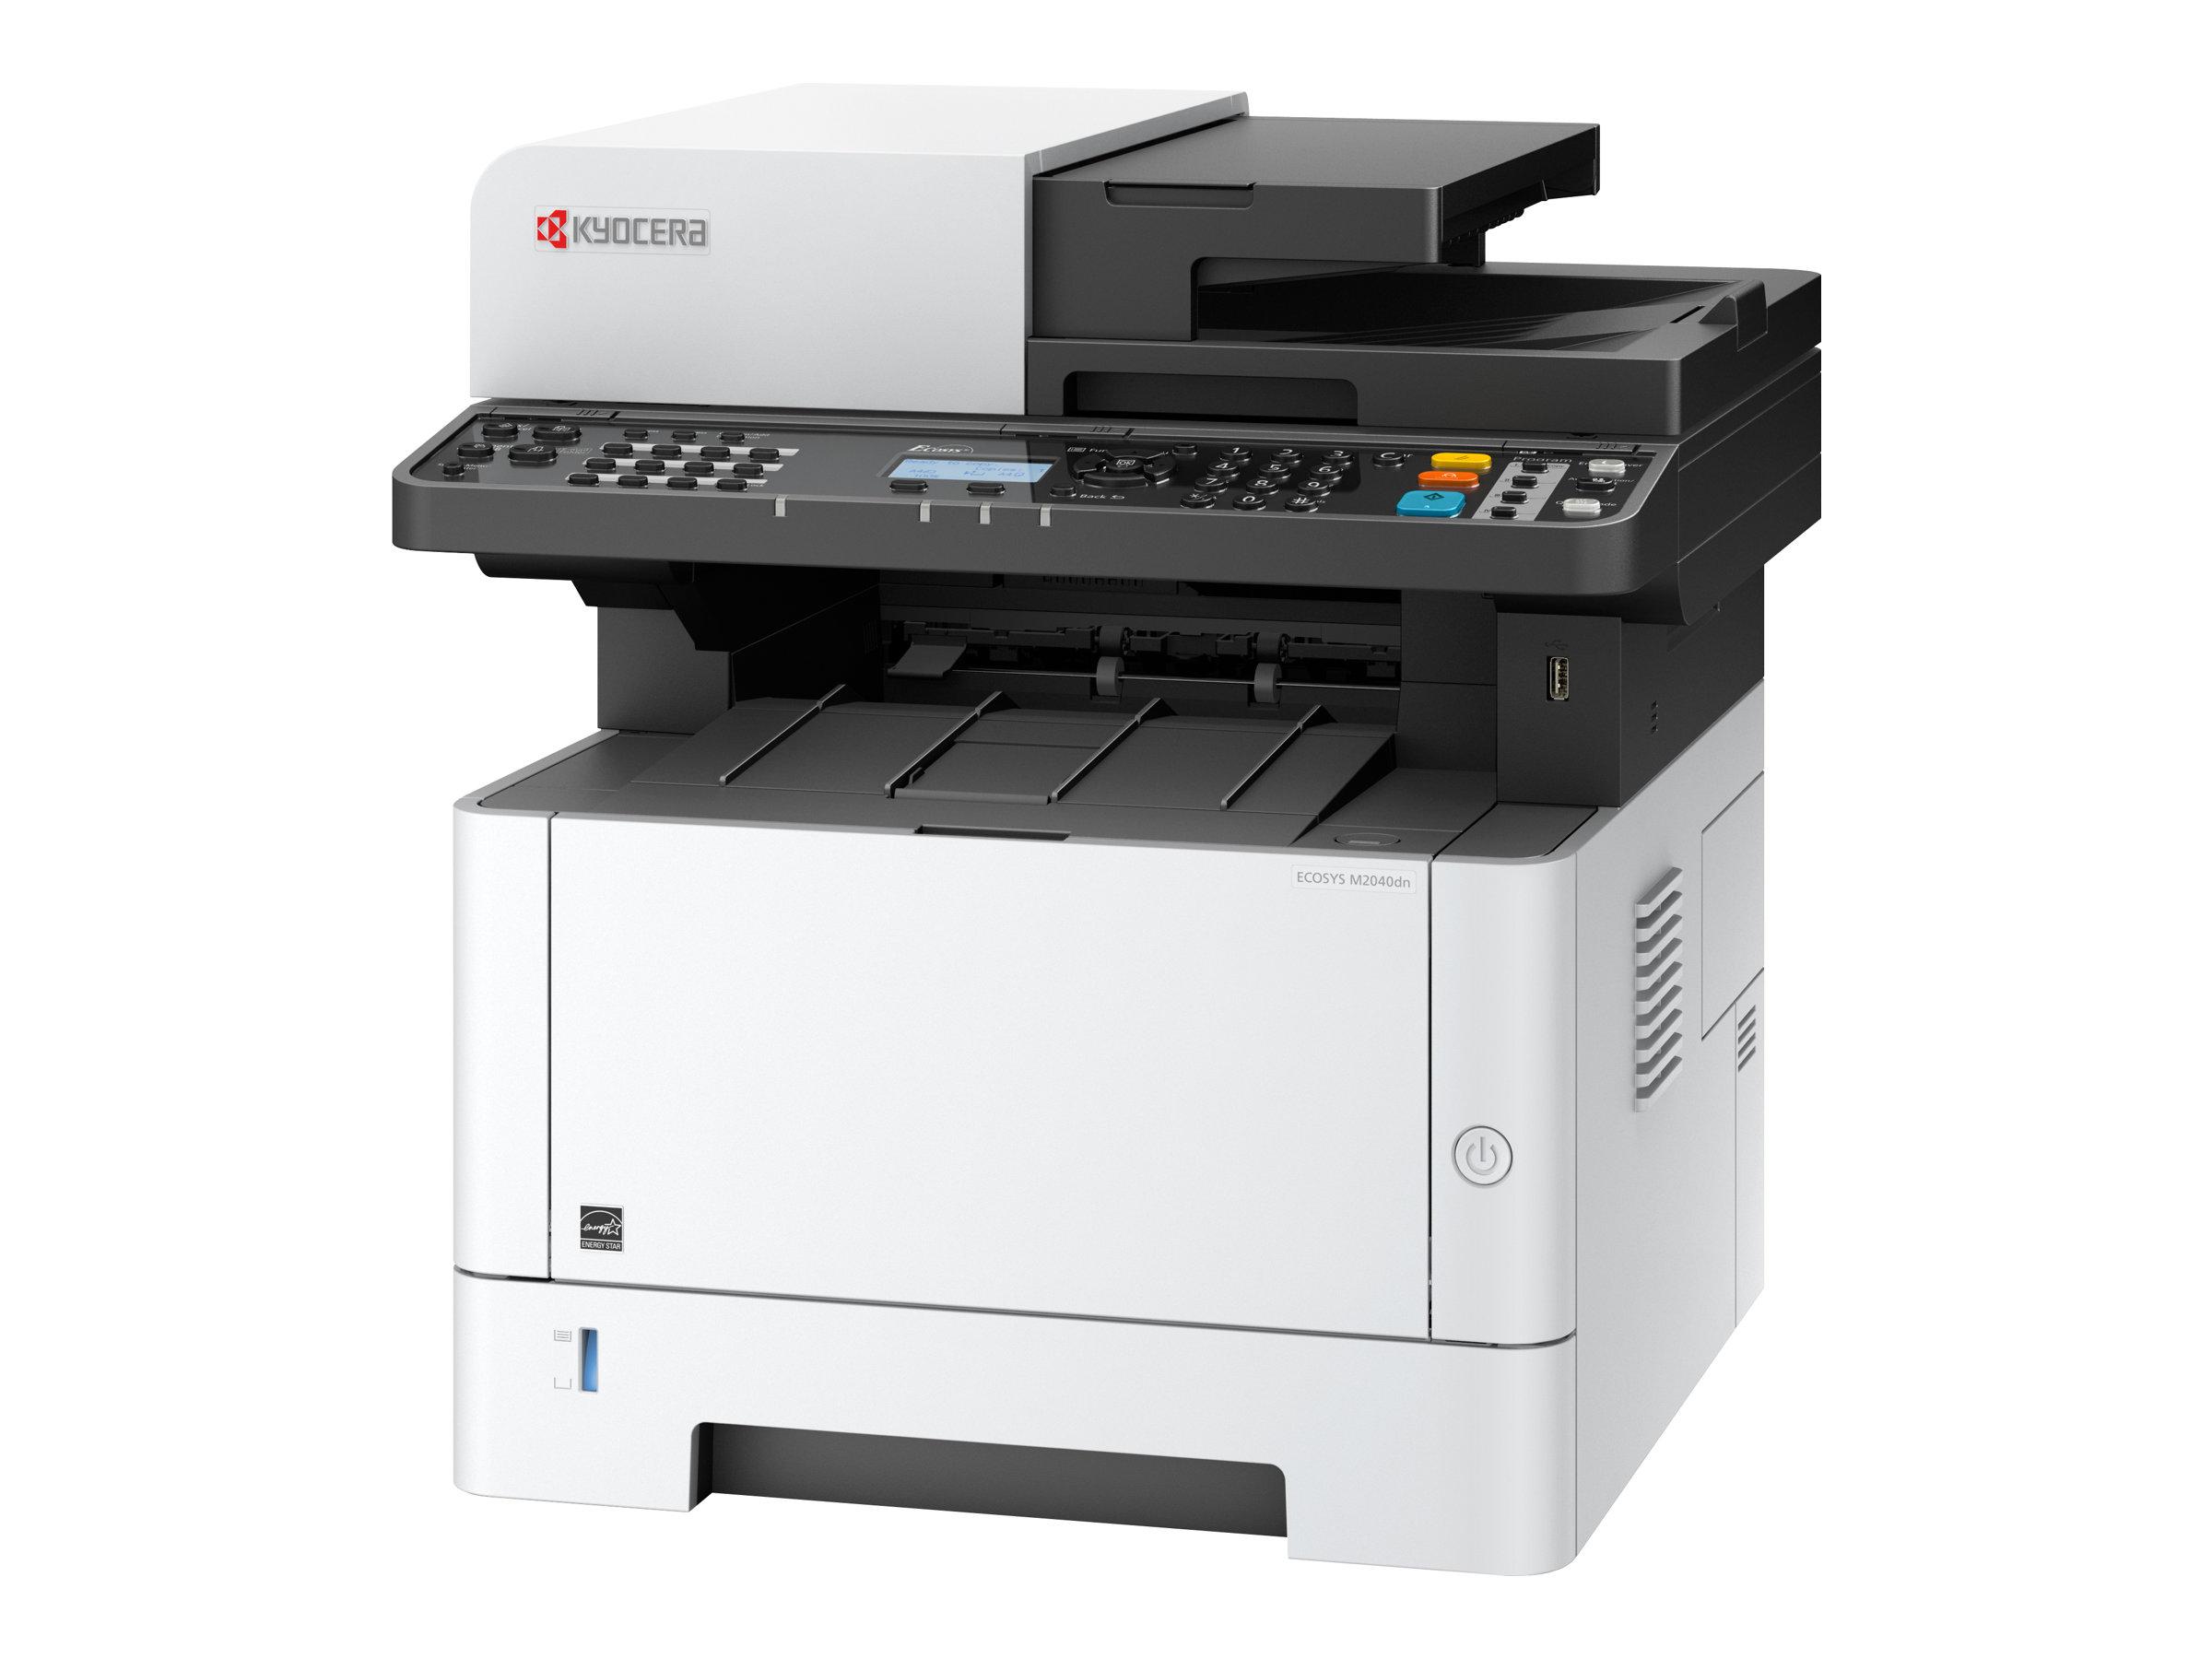 Kyocera ECOSYS M2040dn - Multifunktionsdrucker - s/w - Laser - Legal (216 x 356 mm)